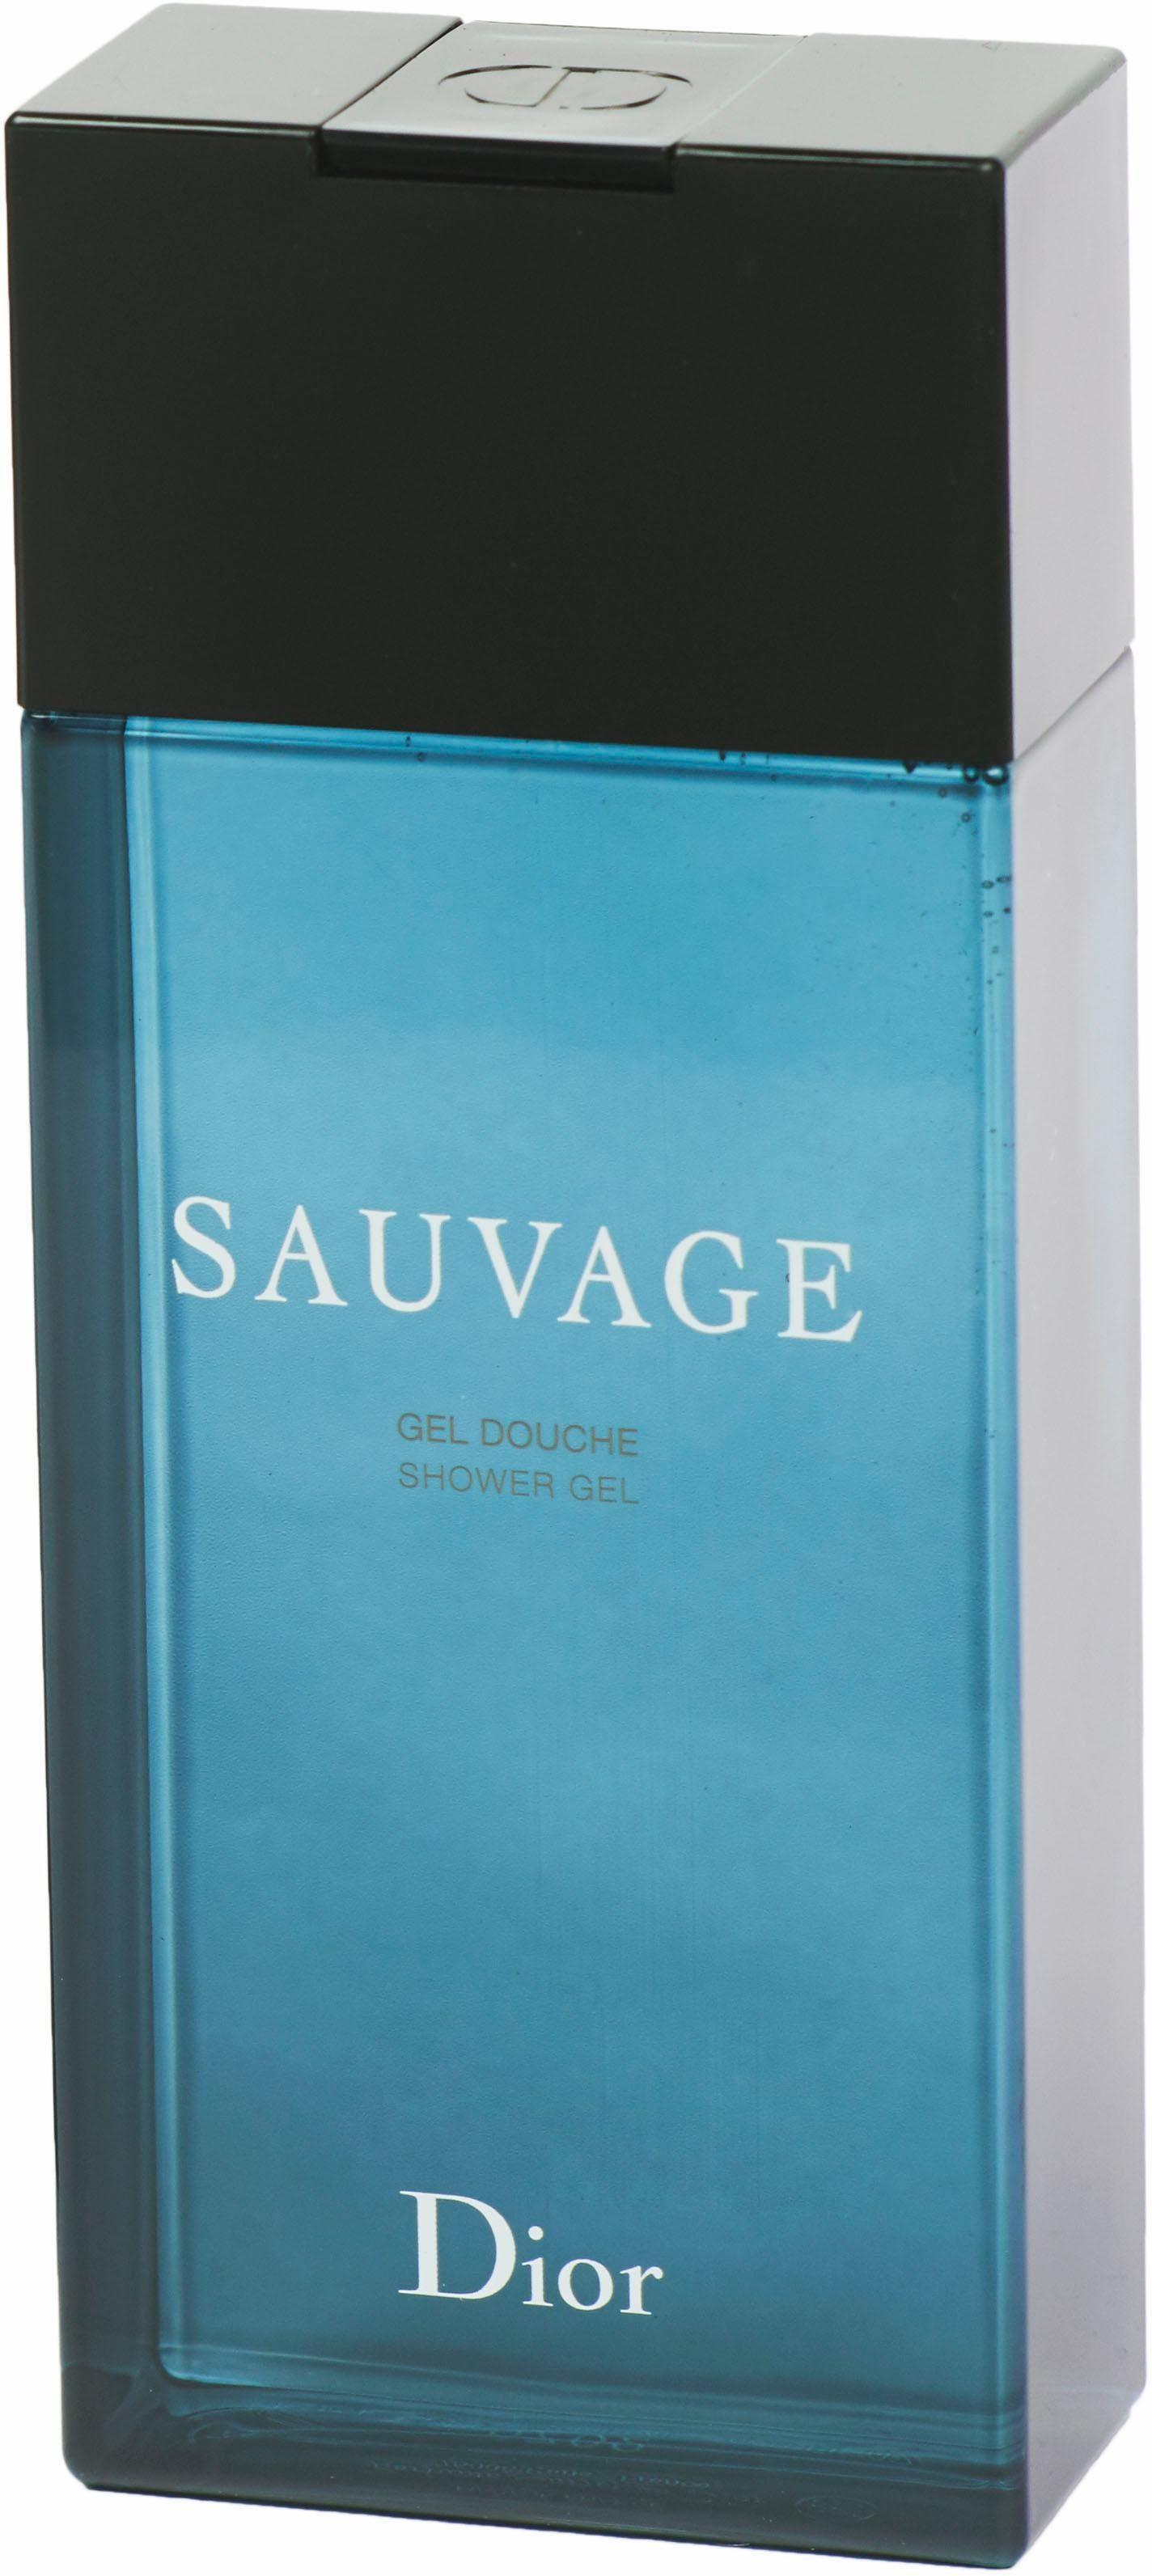 Dior, »Sauvage«, Duschgel